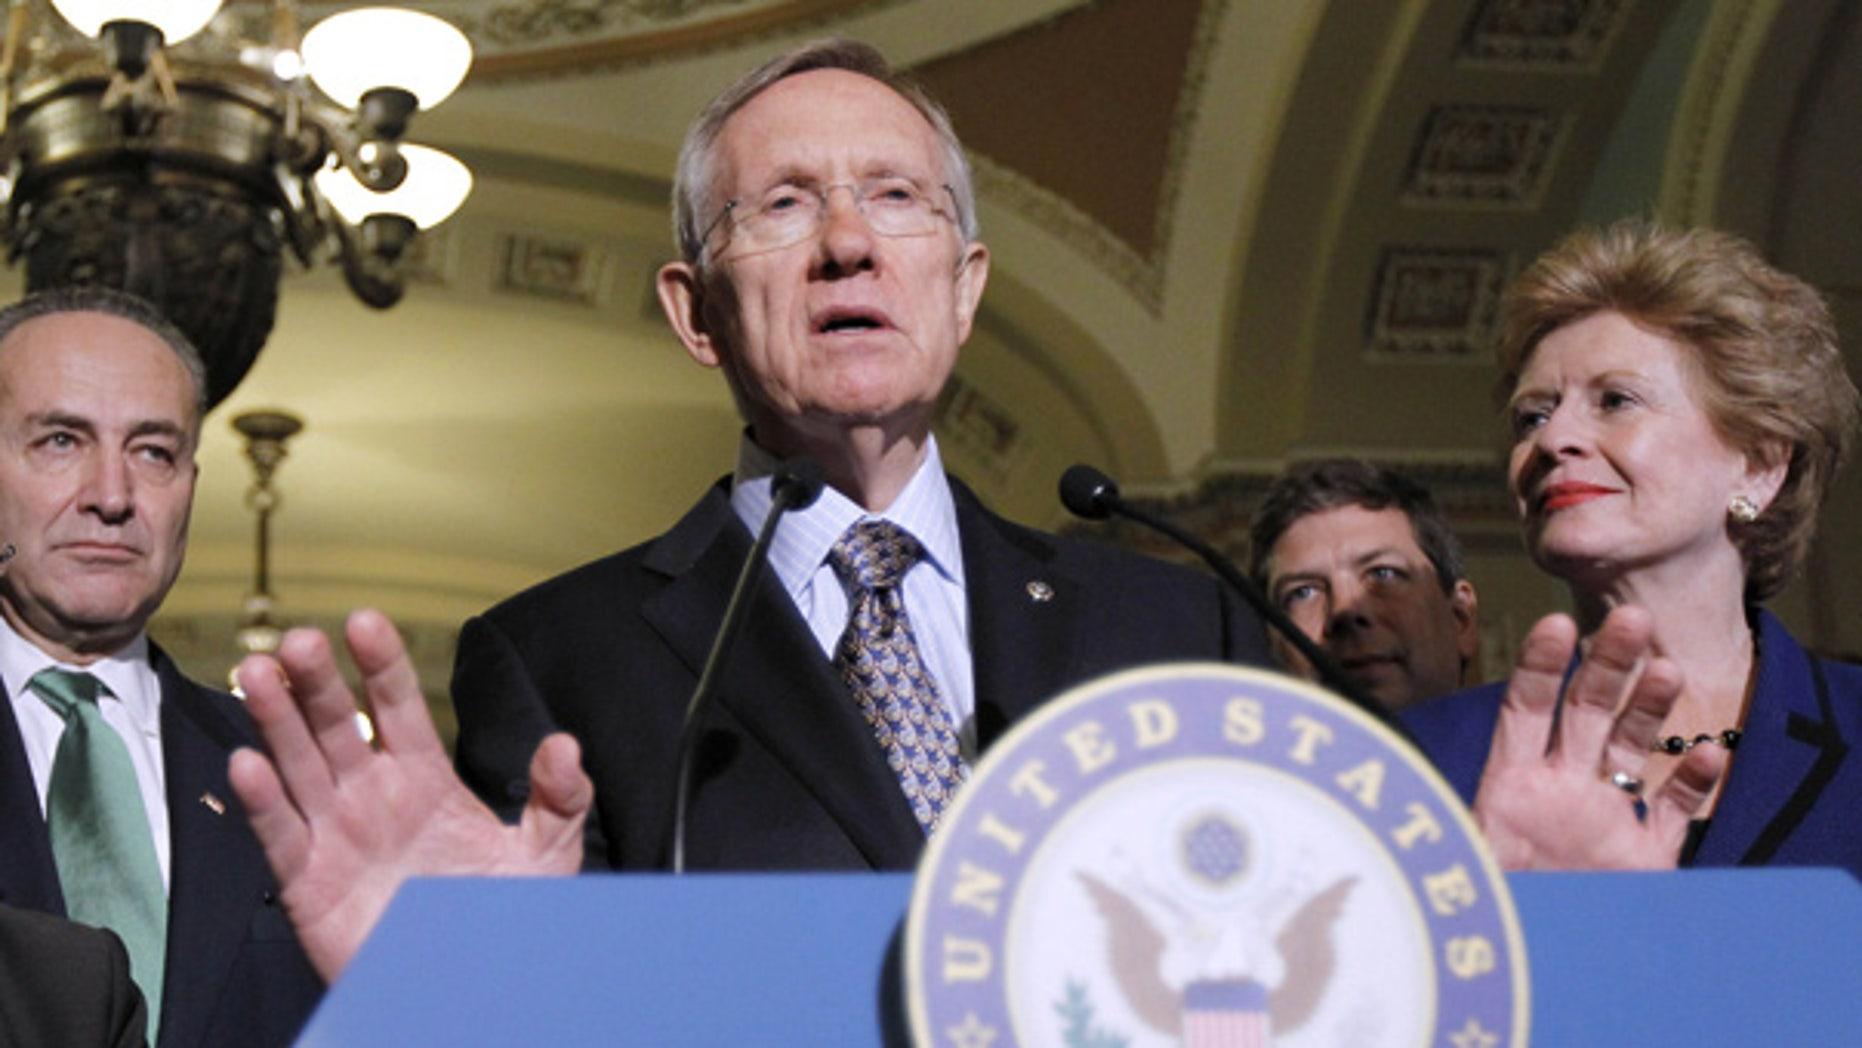 Nov. 16: Senate Majority Leader Harry Reid at a news conference on Capitol Hill in Washington.